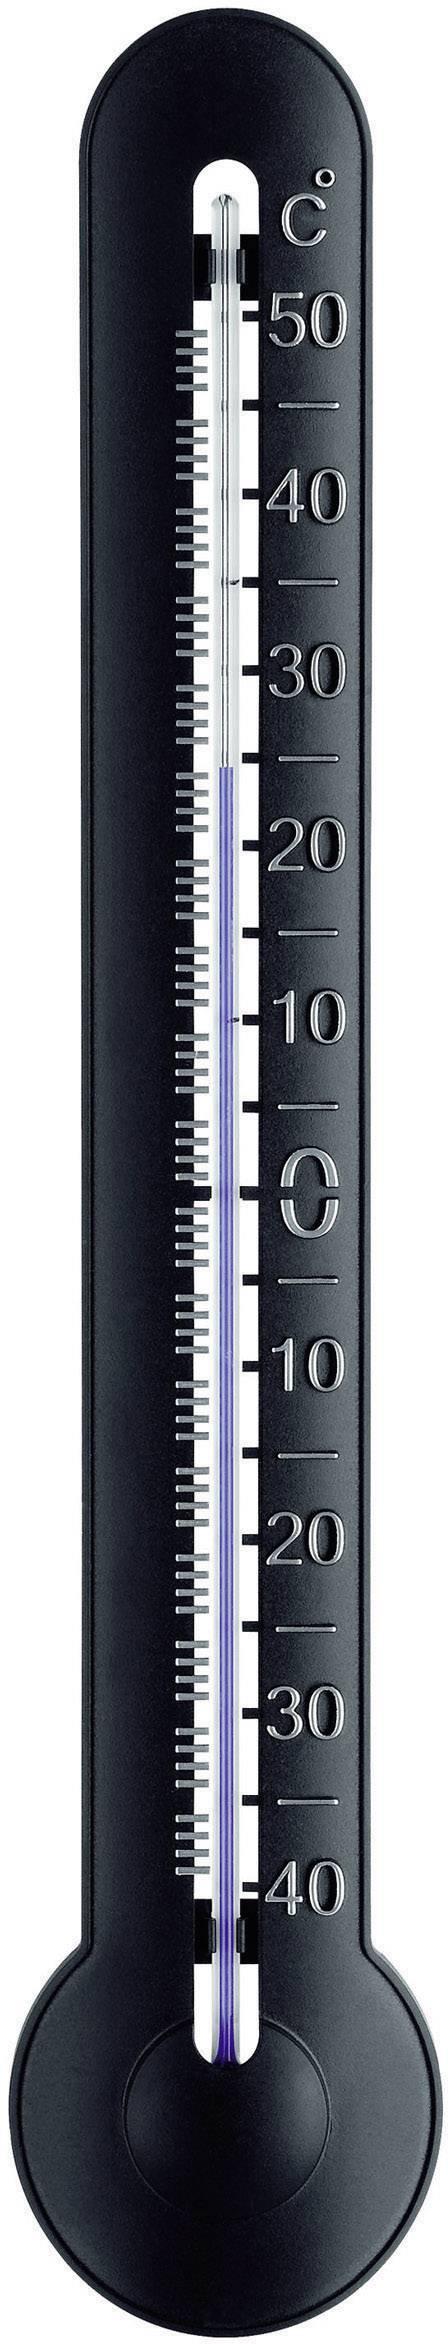 Topmoderne TFA 12.3048 Væg Termometer Sort | Conradelektronik.dk ST-44